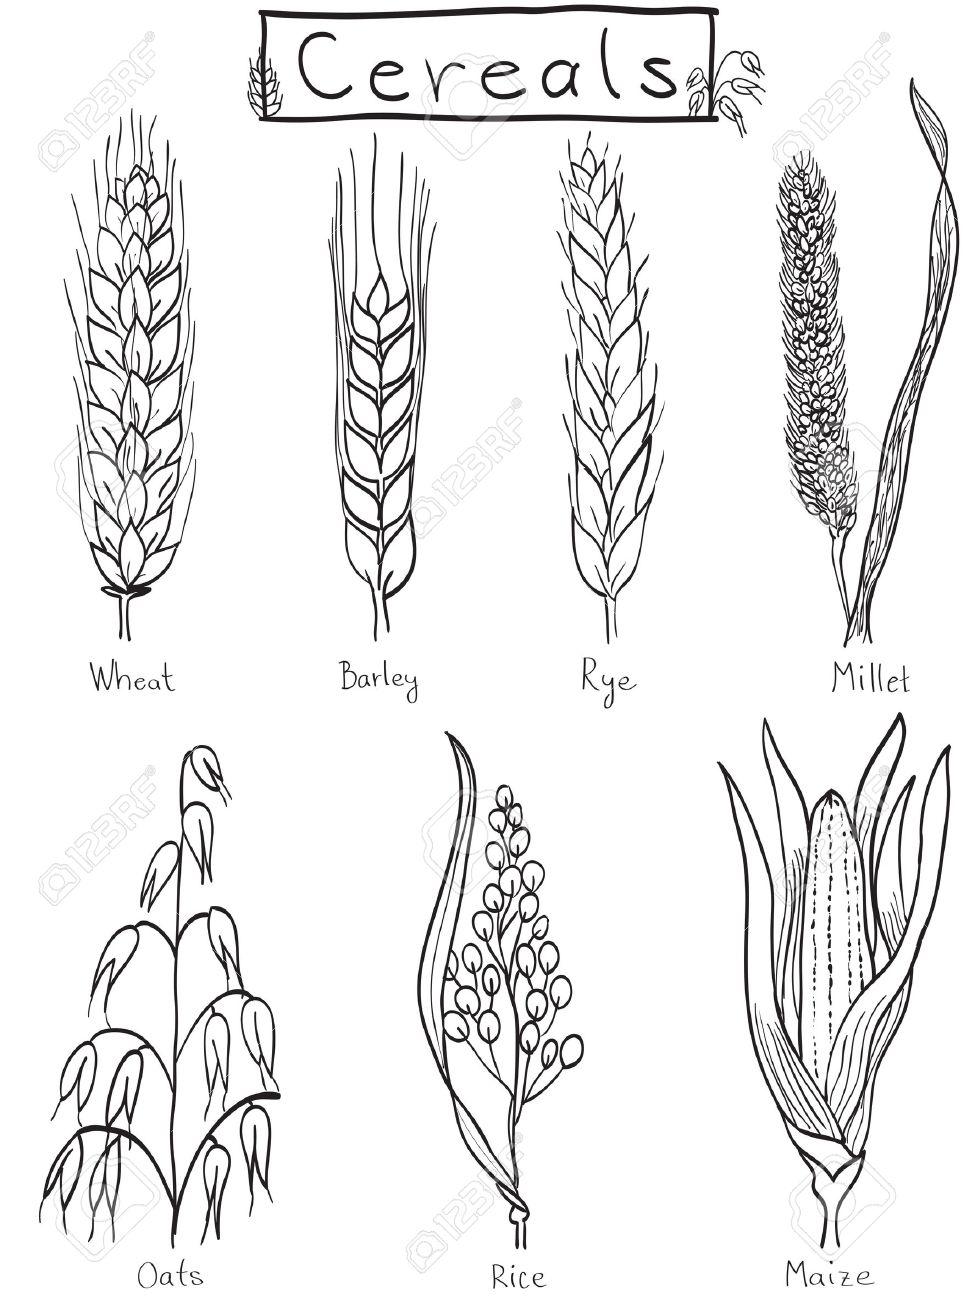 medium resolution of cereals hand drawn illustration wheat barley rye millet oat